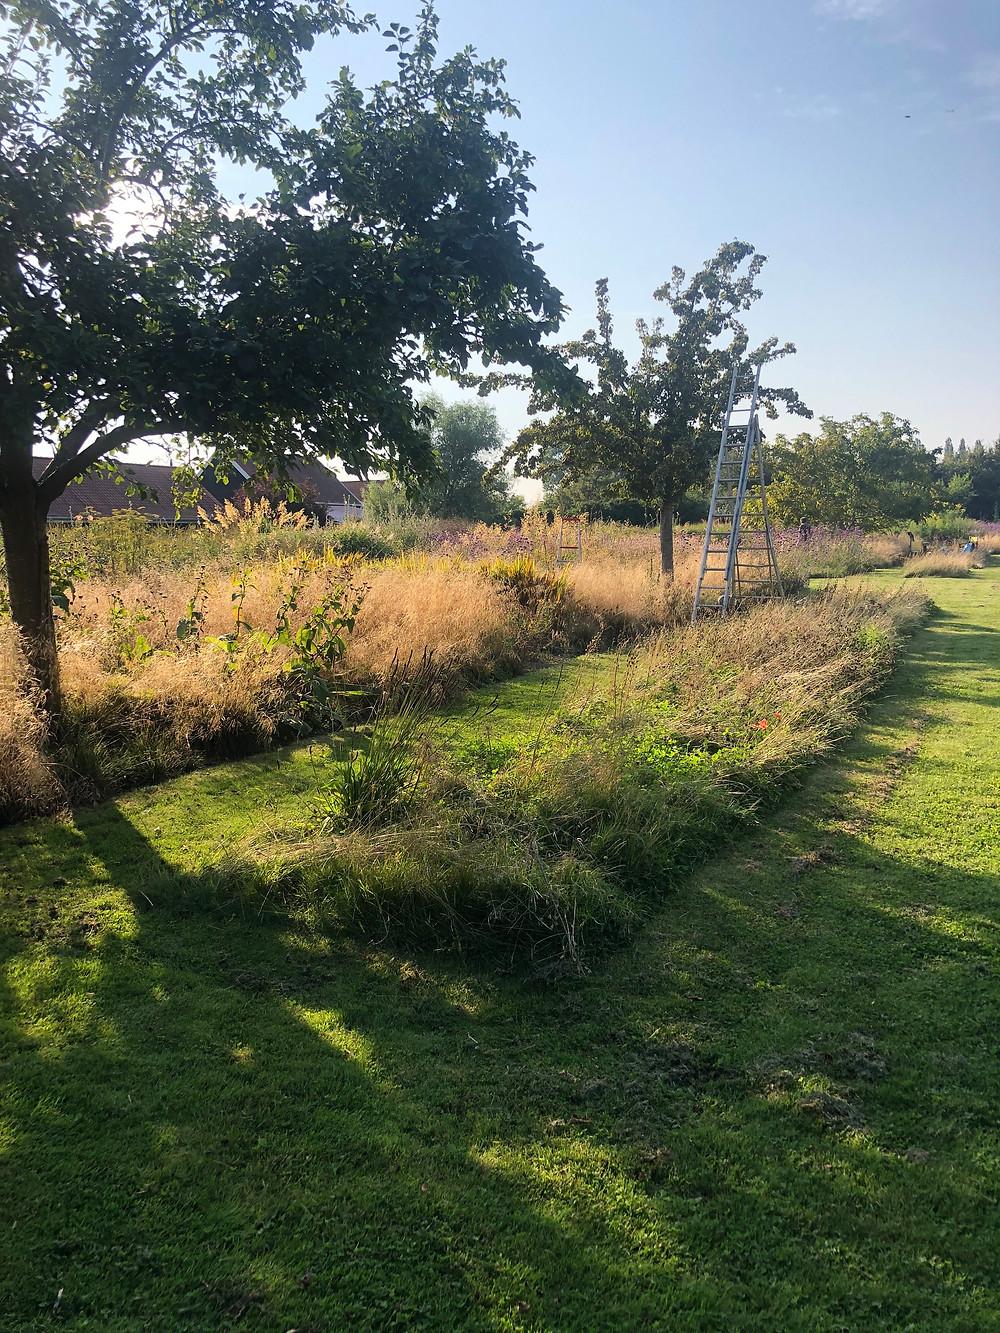 Tuinarchitect regio Rotterdam, tuinarchitect regio Zeeland, studio linda lavoir, ecologische tuinarchitect doet inspiratie op in Middelburg